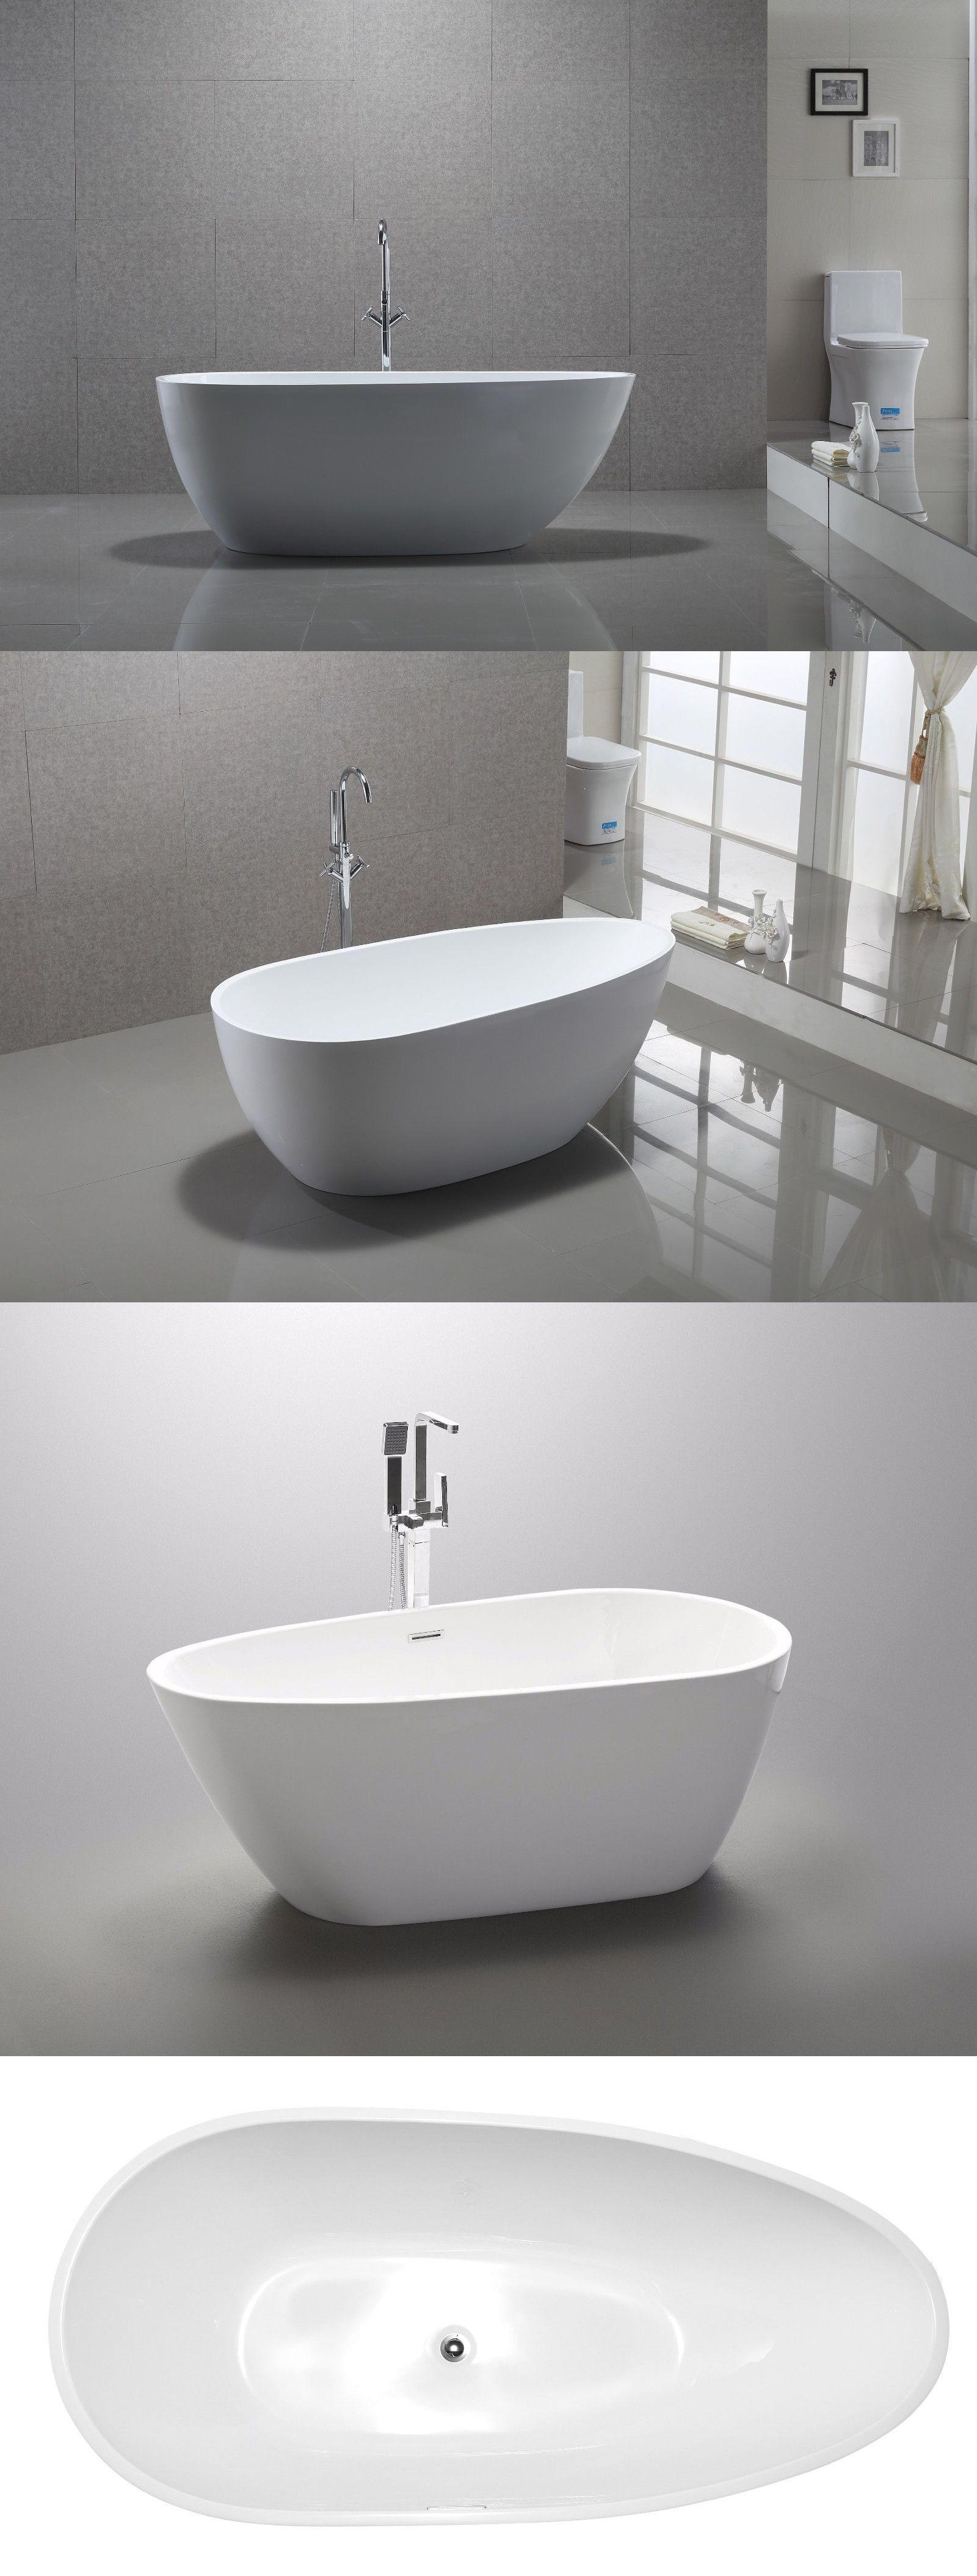 Bathtubs 42025: 59 Or 67 Vanity Art Bathroom Free Standing Acrylic ...